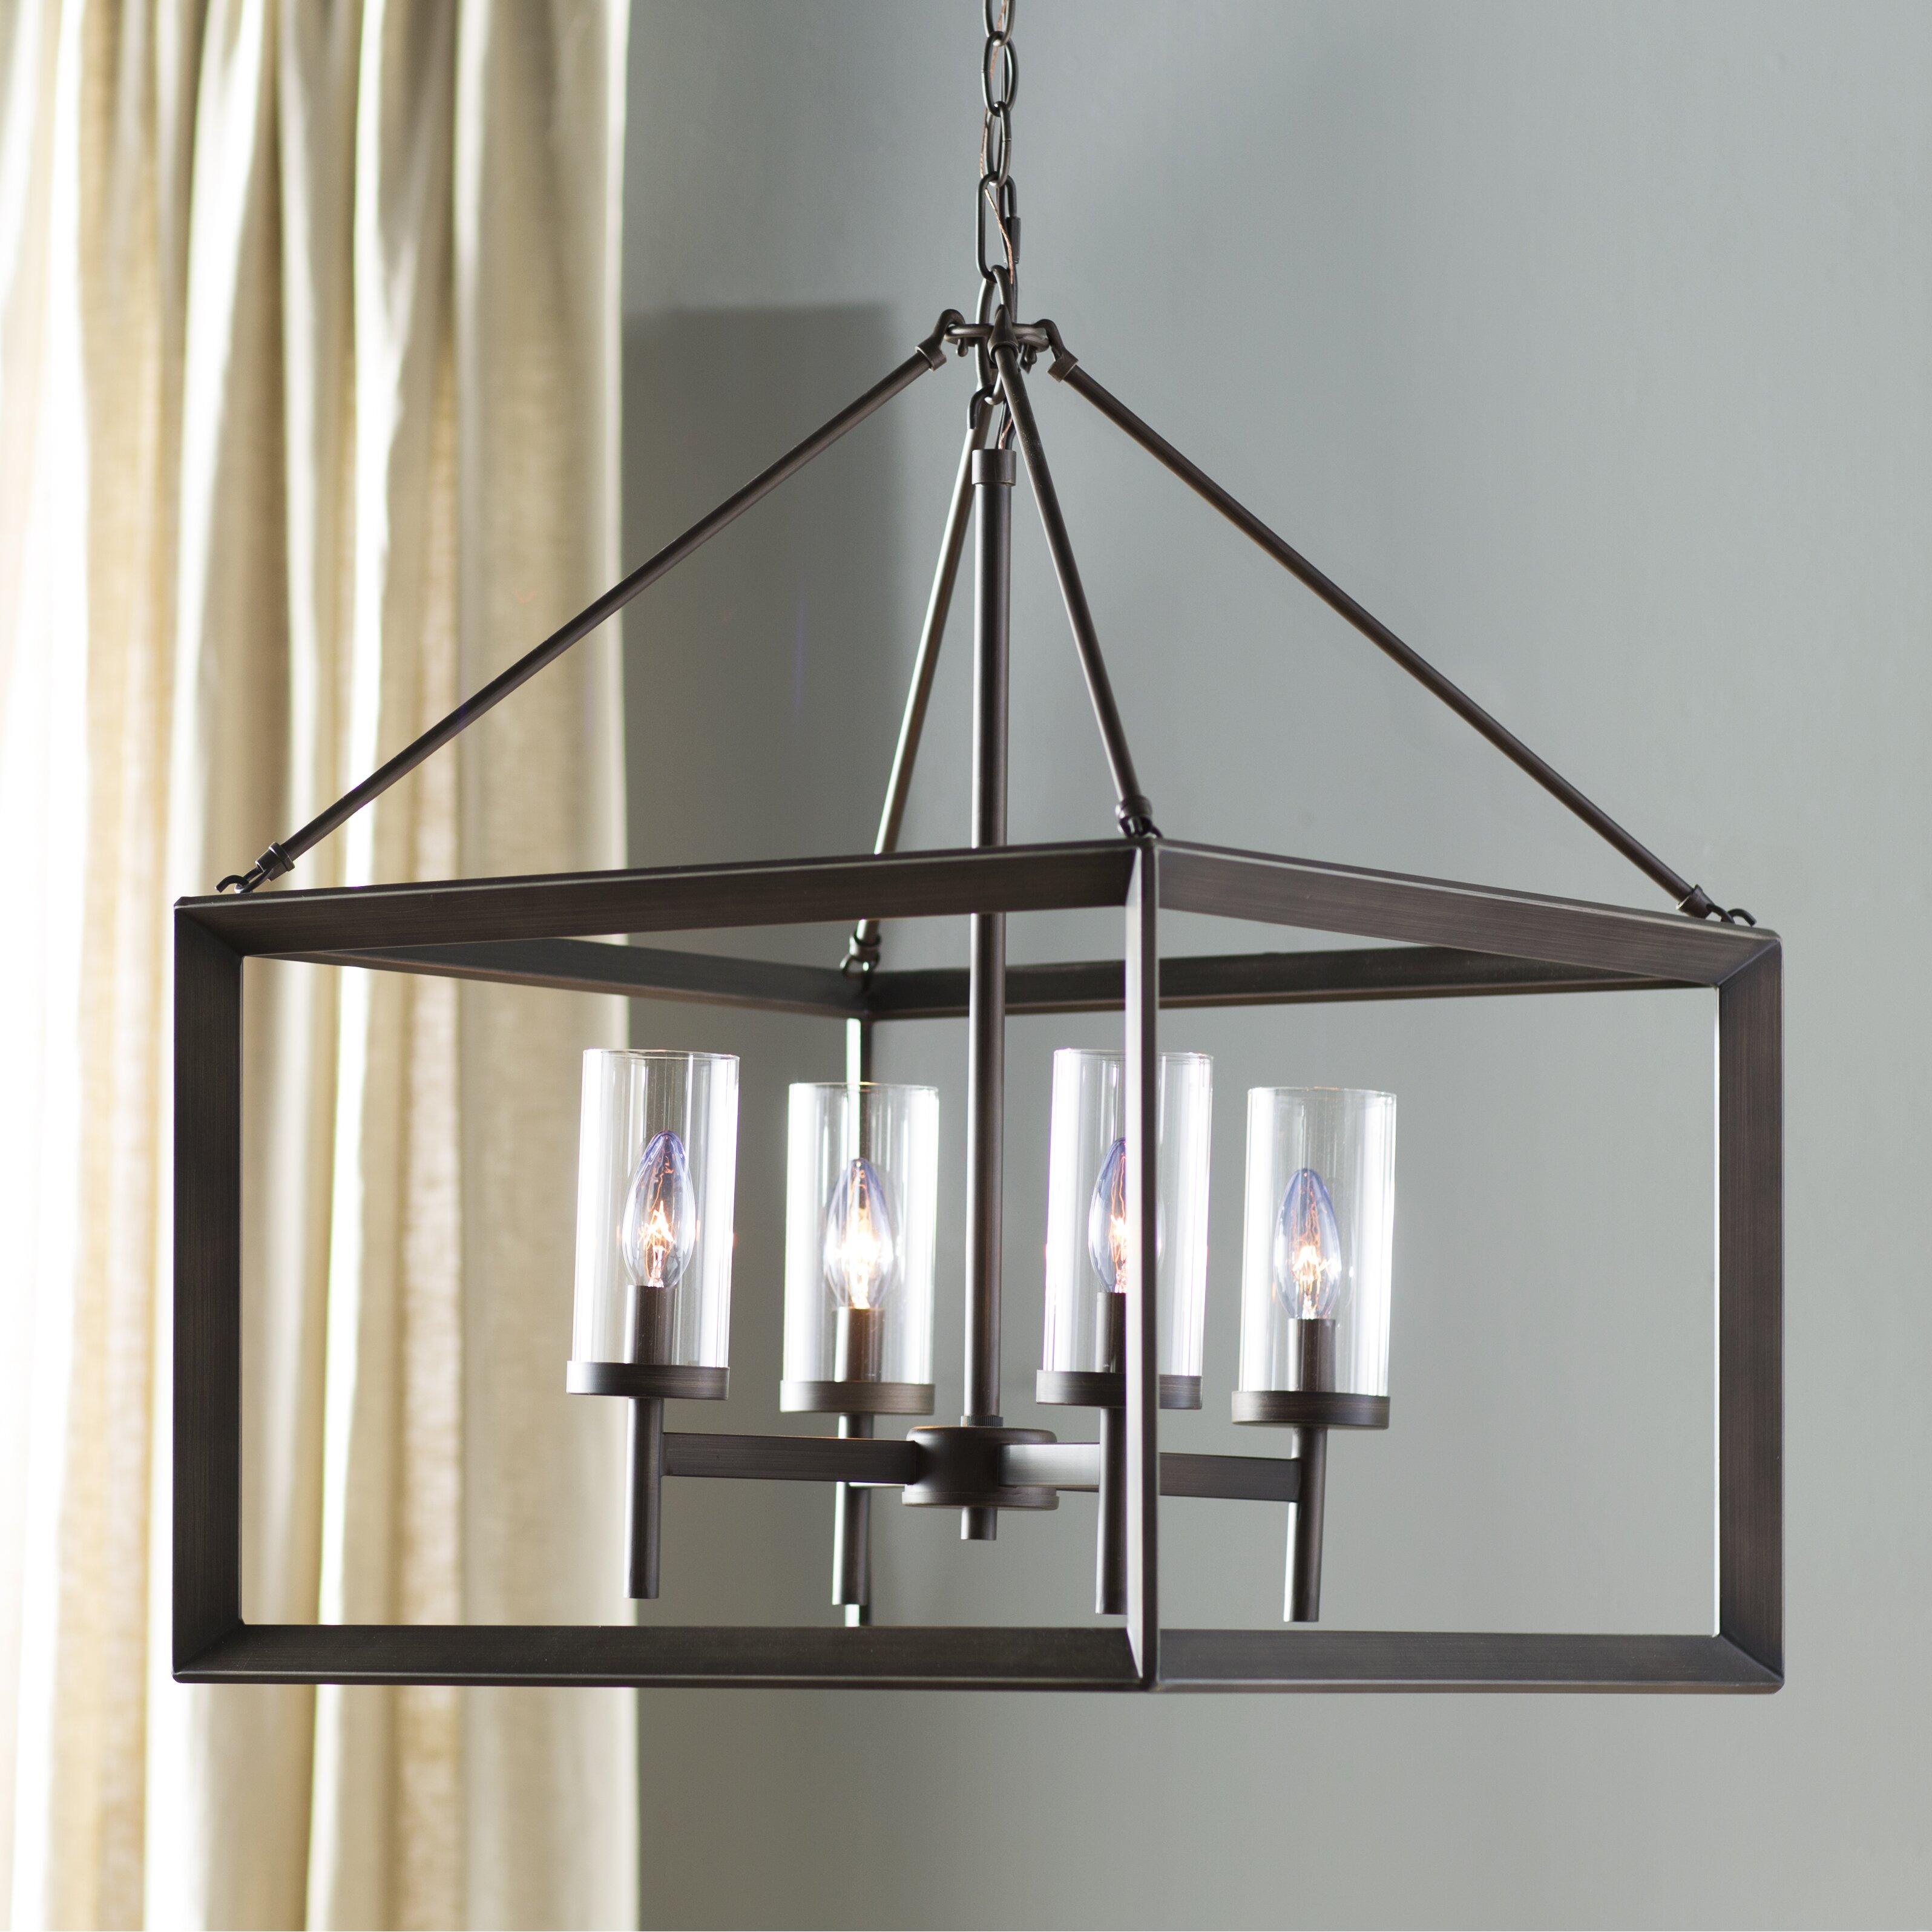 August grove 4 light candle chandelier reviews wayfair for Wayfair industrial lamp